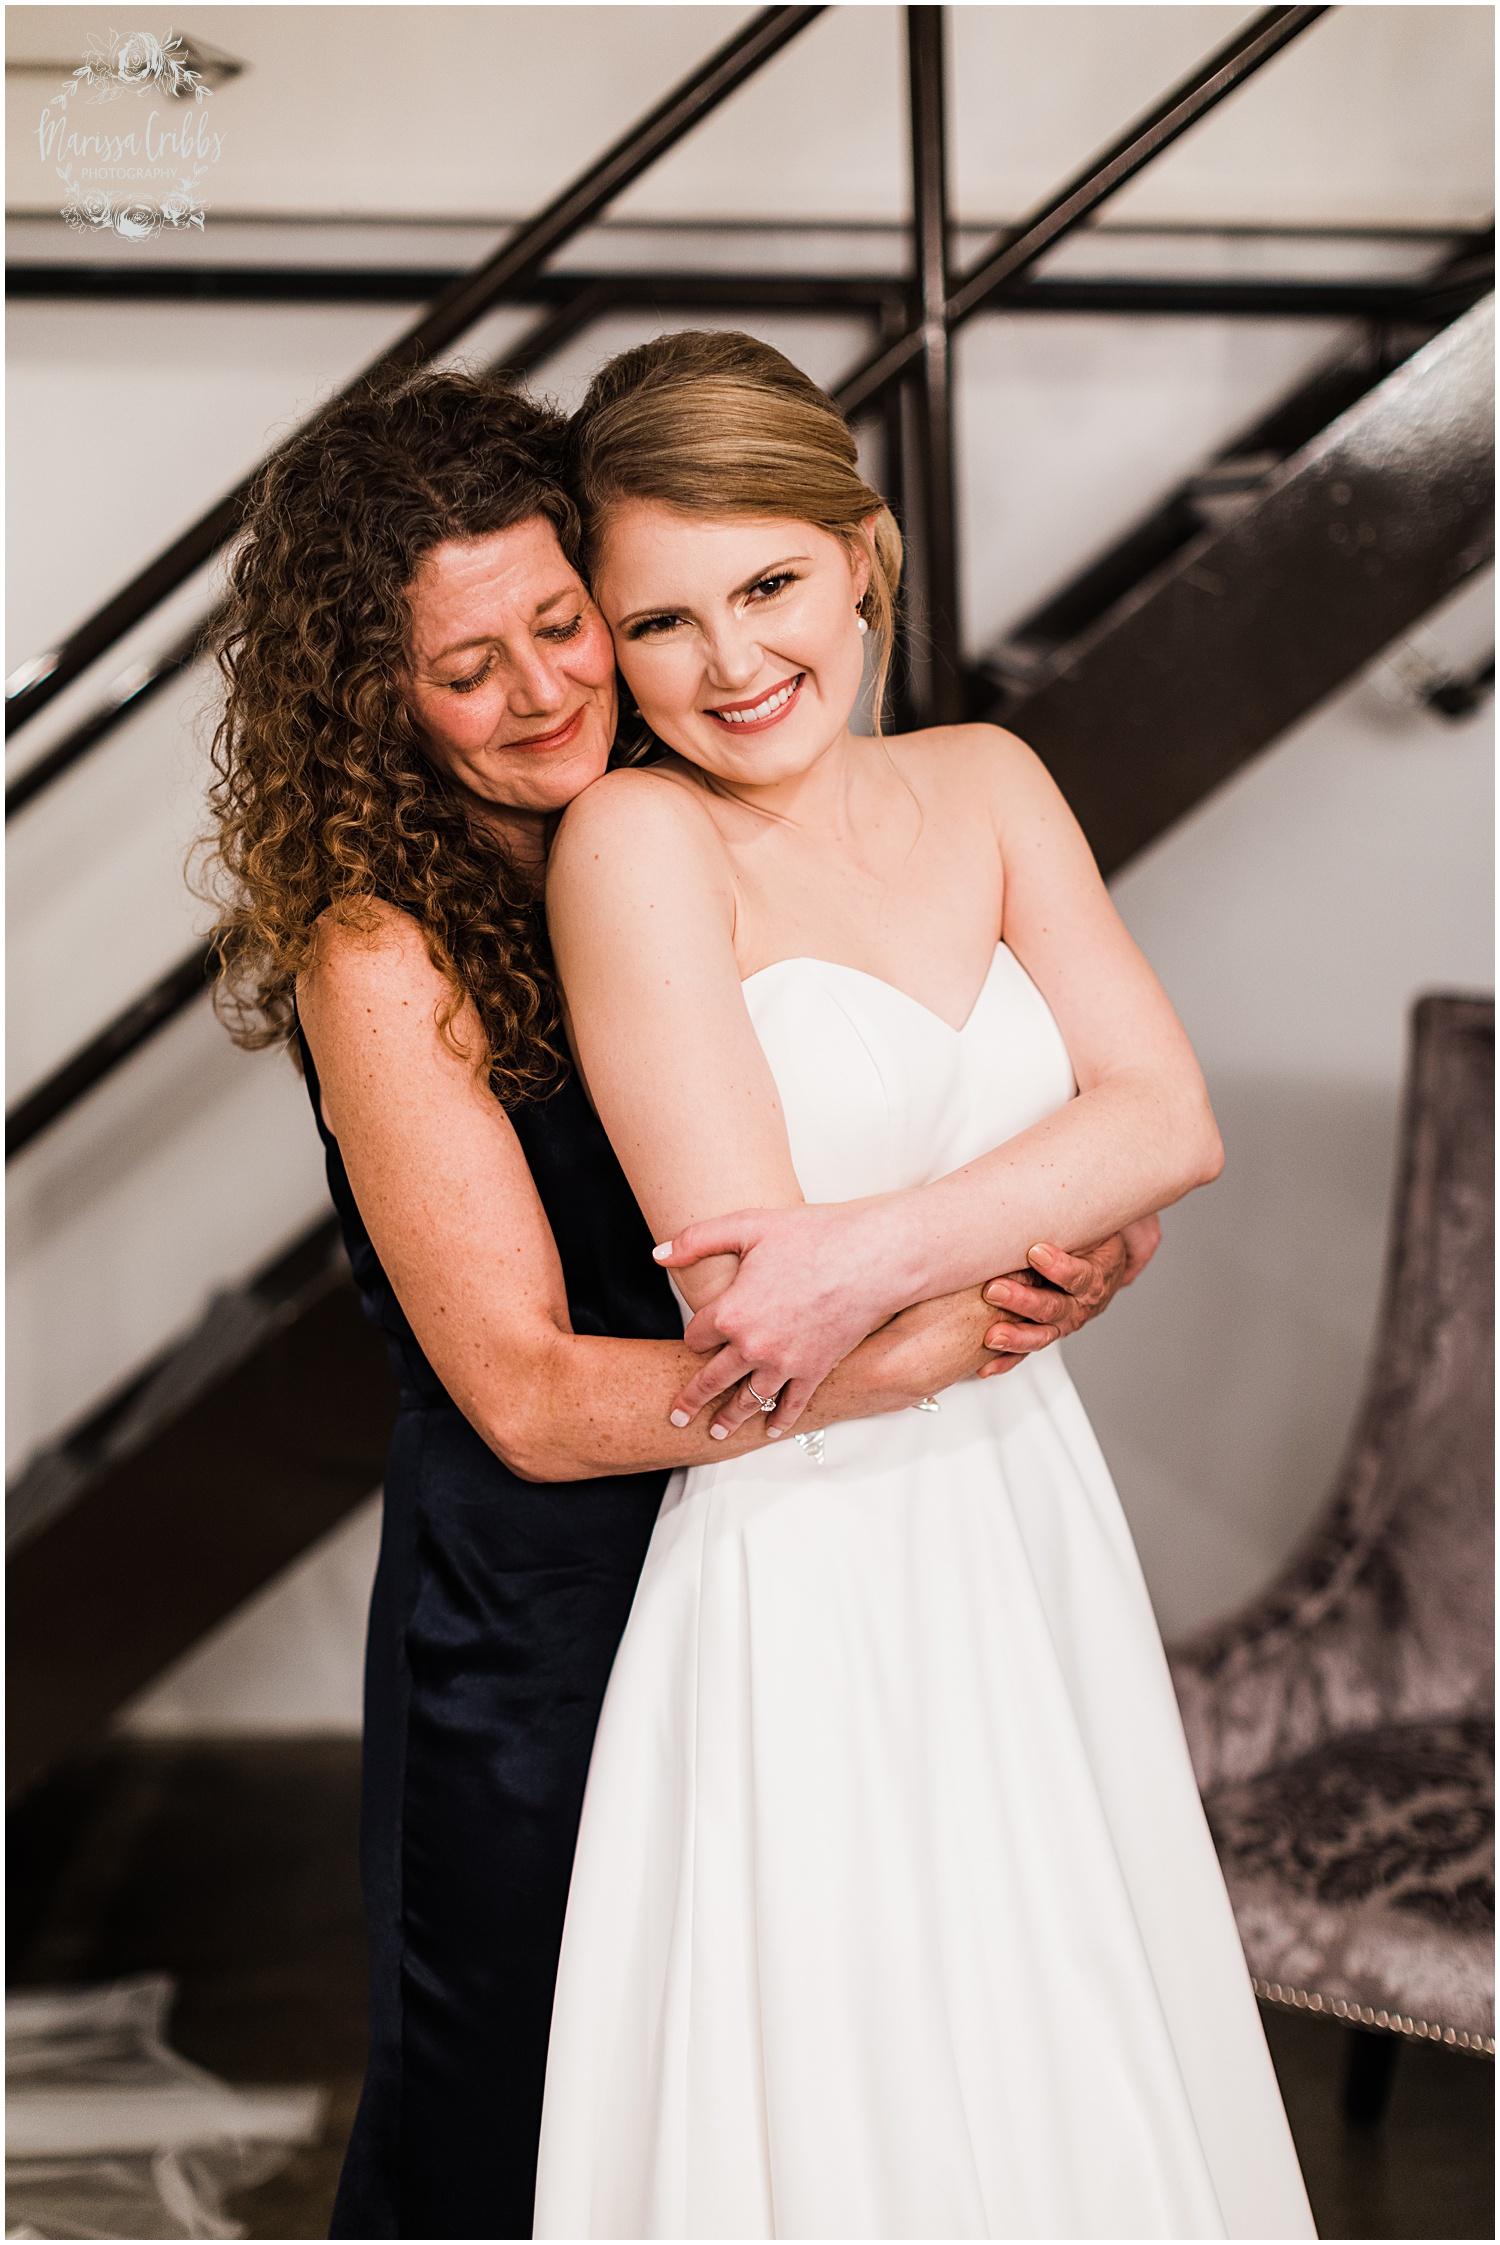 ABBY & CHARLIE WEDDING   THE HUDSON EVENT SPACE WEDDING   MARISSA CRIBBS PHOTOGRAPHY_7498.jpg